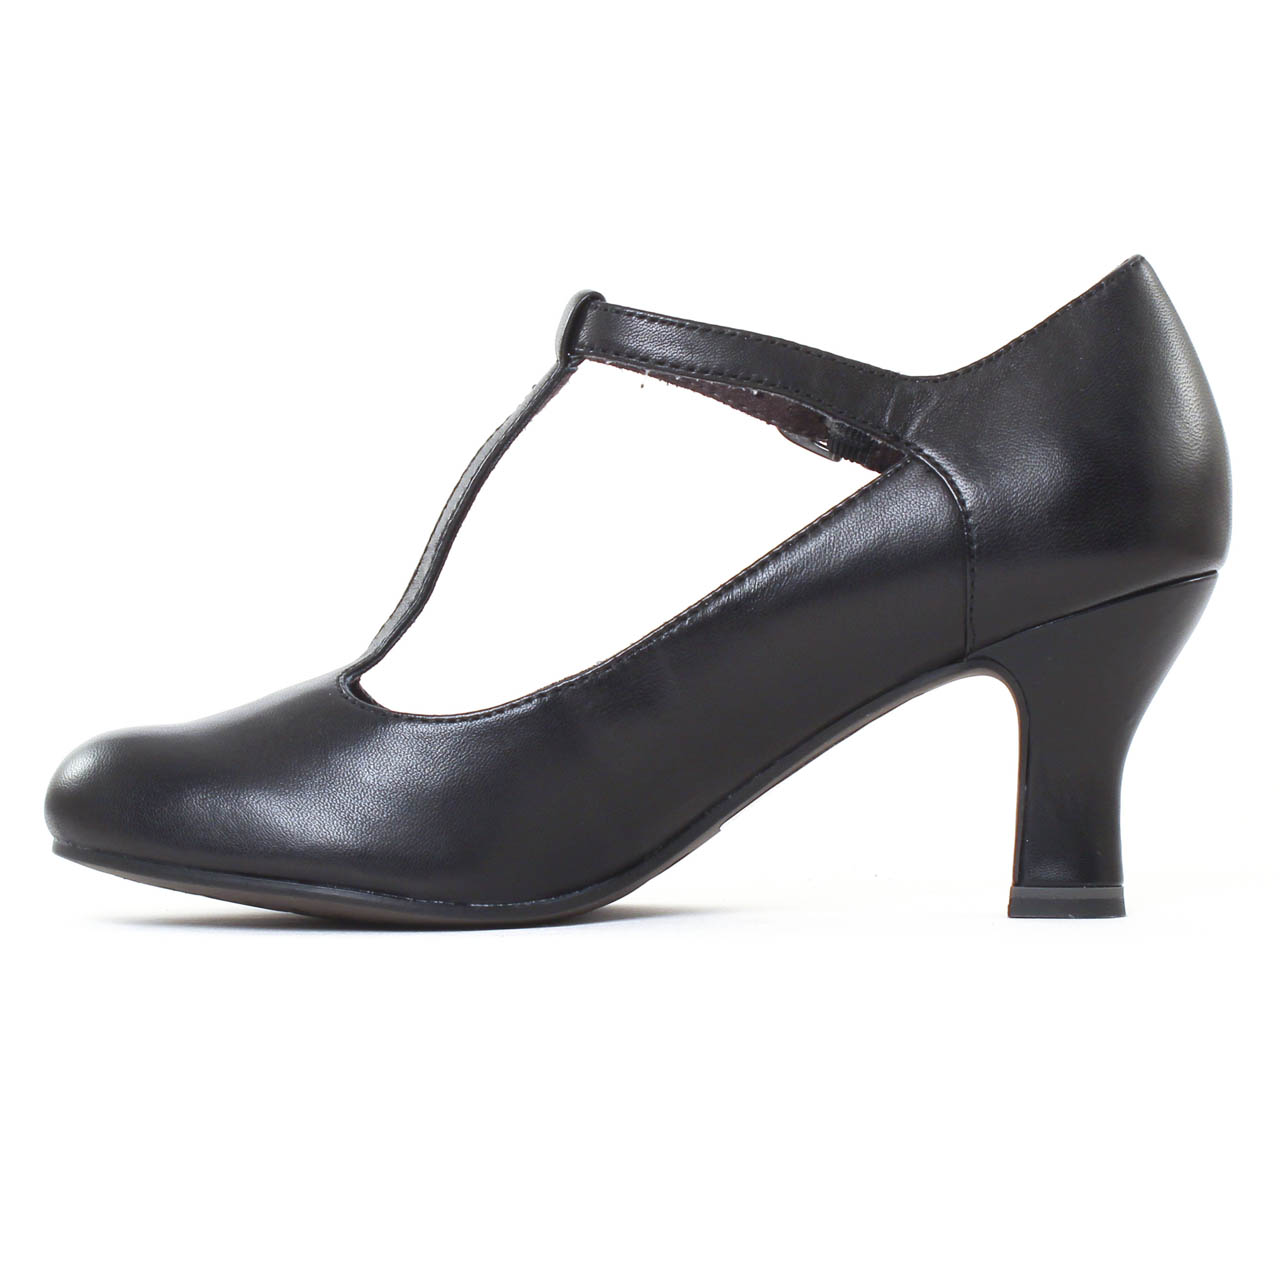 chaussures salome tamaris,tamaris chaussures pour femmes